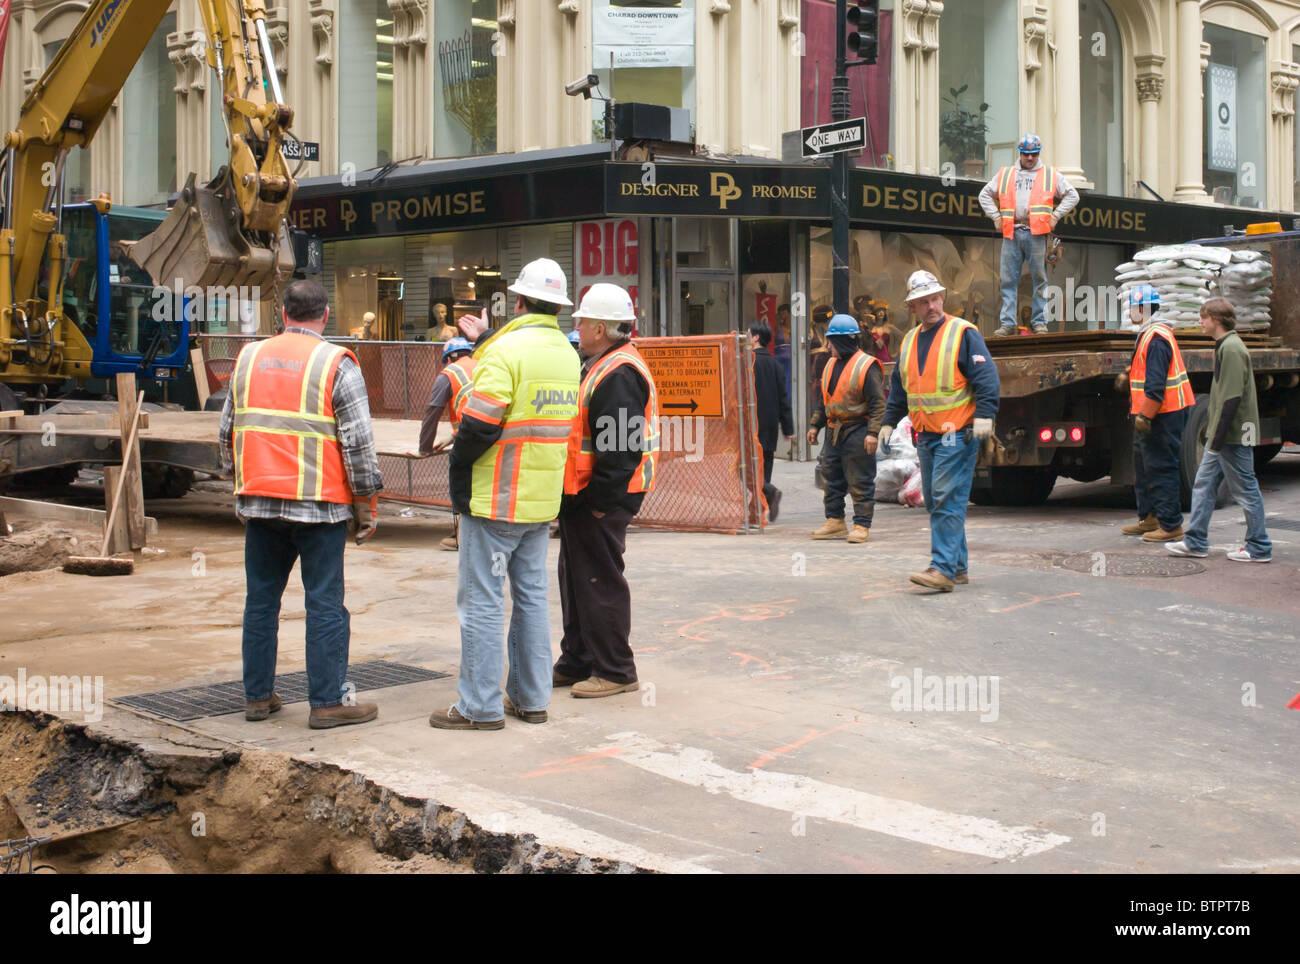 A street repair crew works in lower Manhattan in New York City, New York. - Stock Image